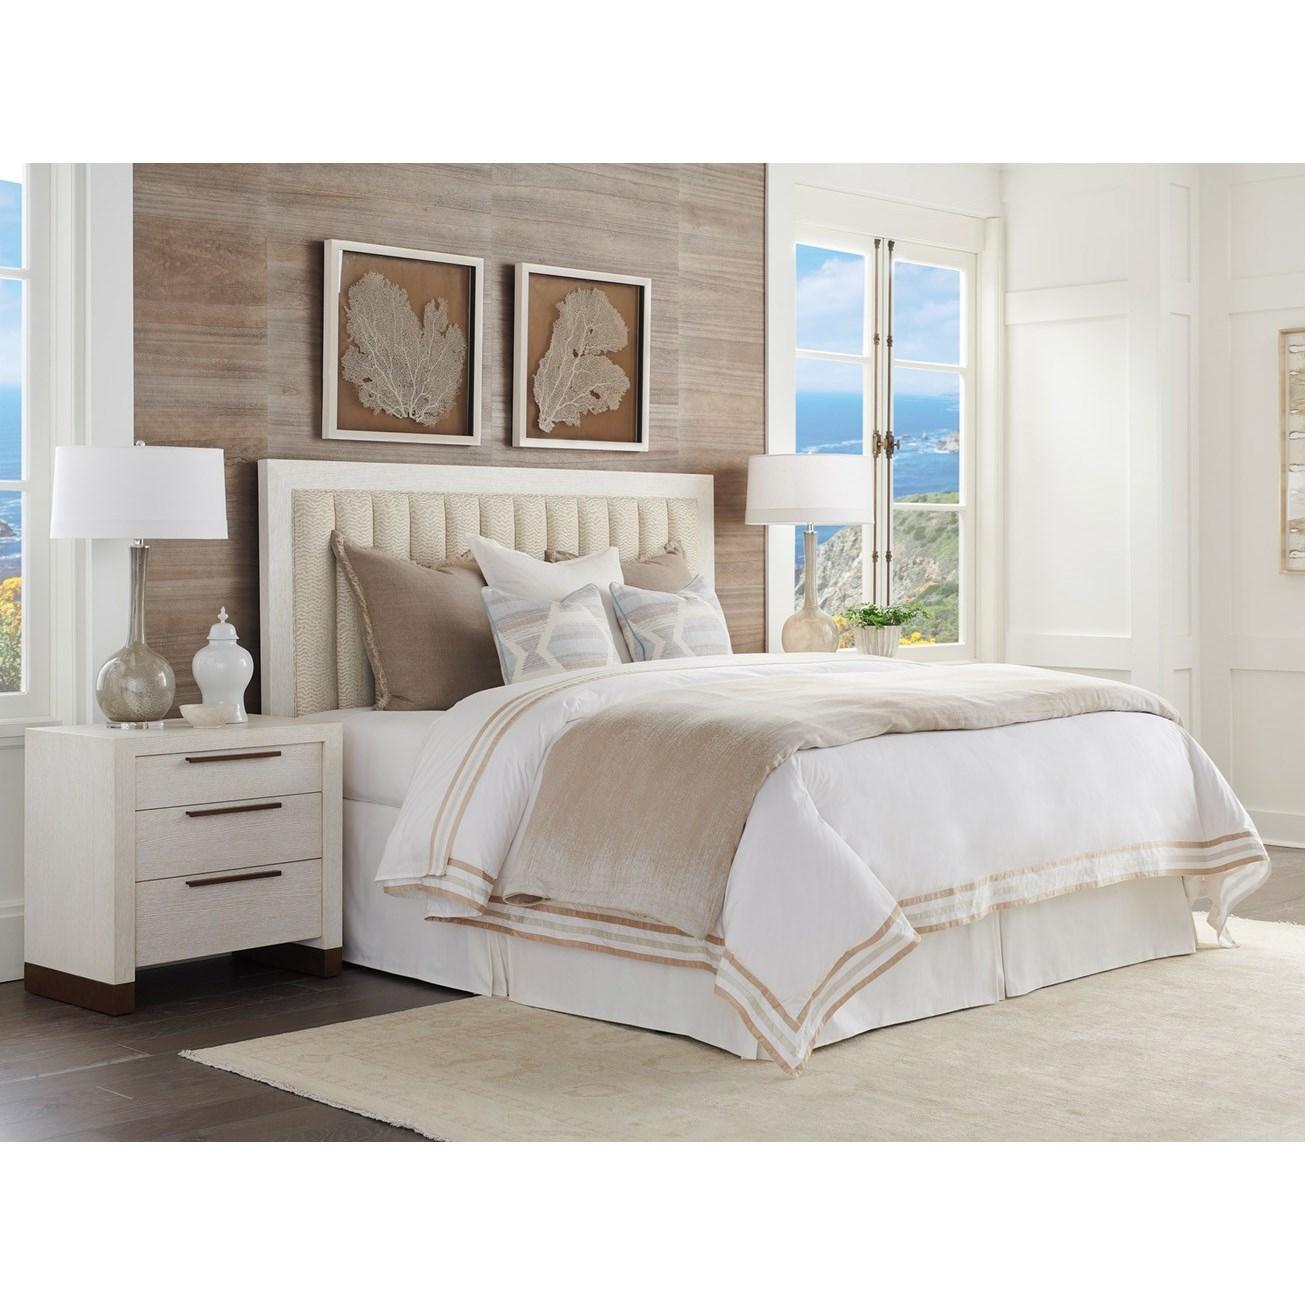 Carmel King Bedroom Group by Barclay Butera at Baer's Furniture